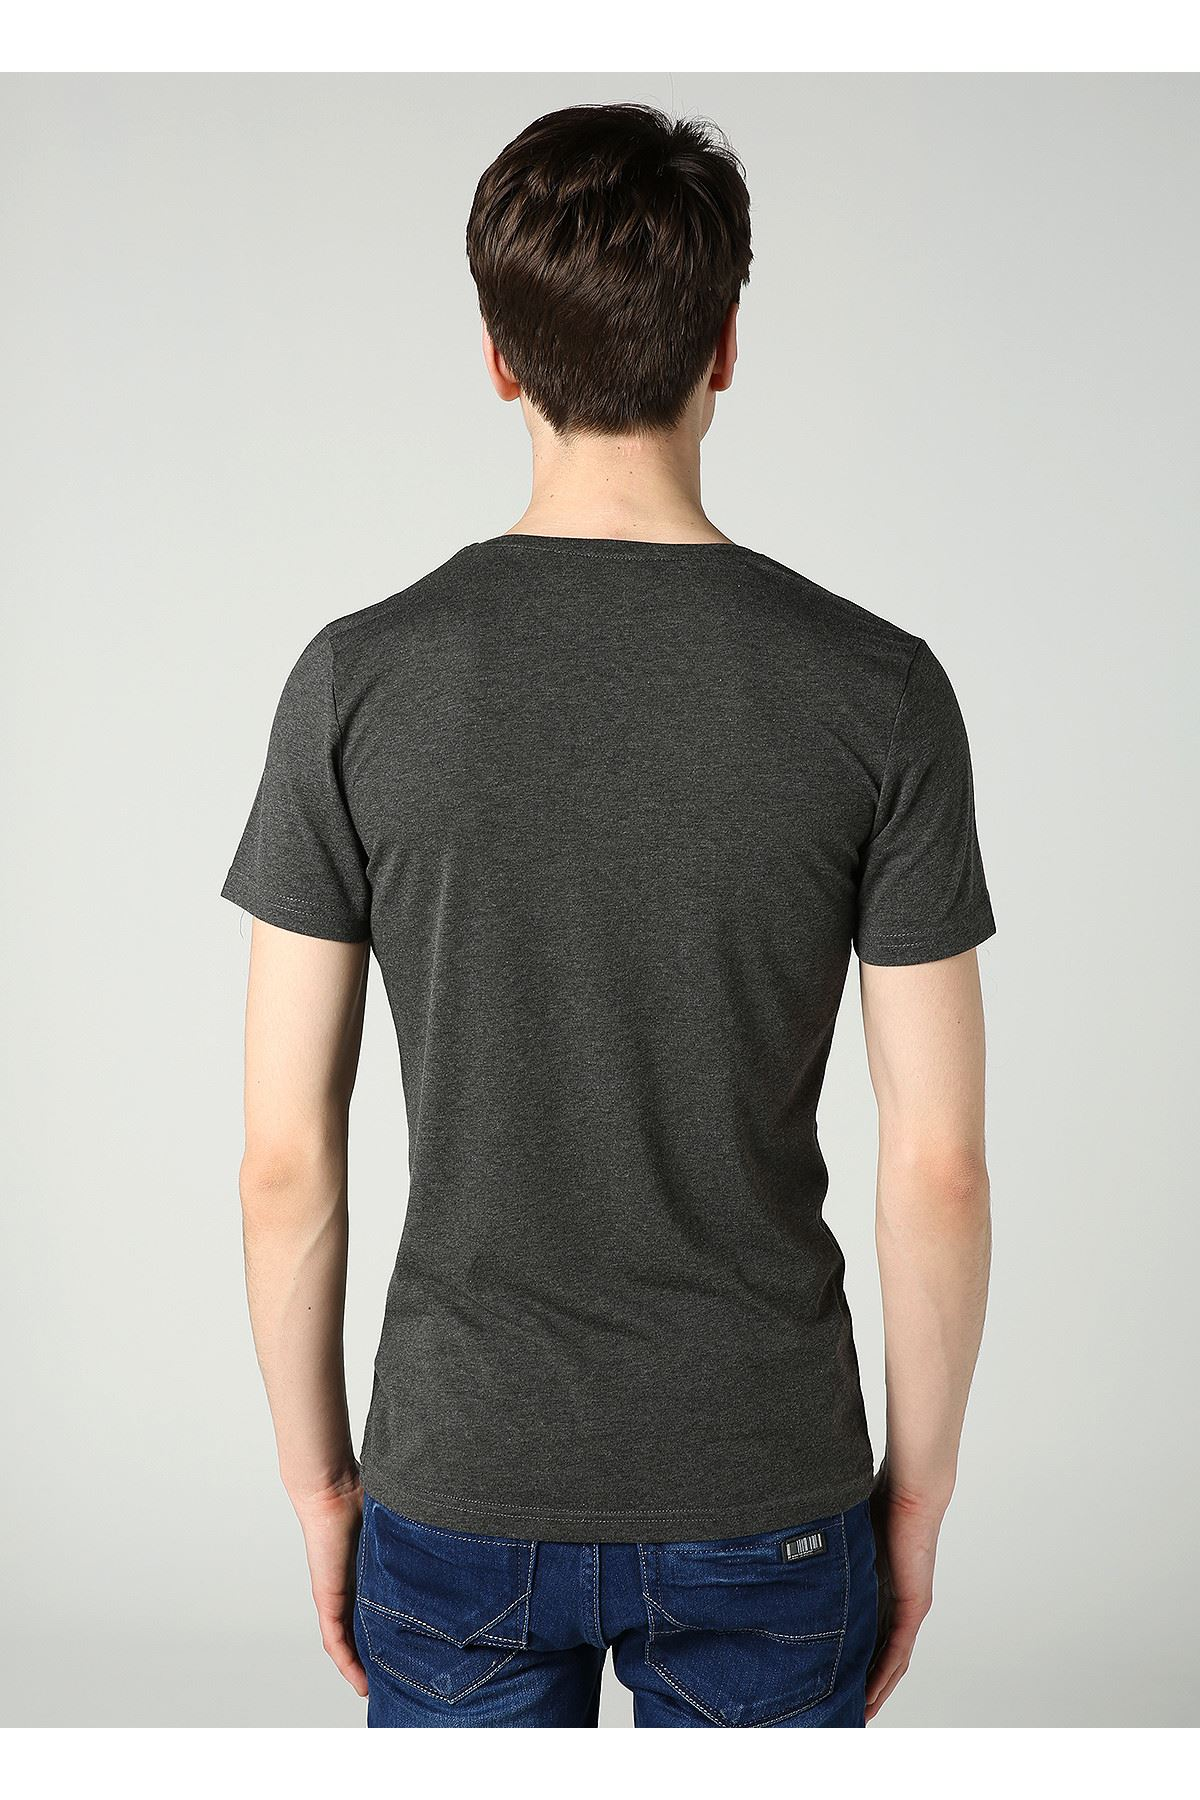 Bisiklet Yaka Baskılı Erkek Antrasit T-Shirt